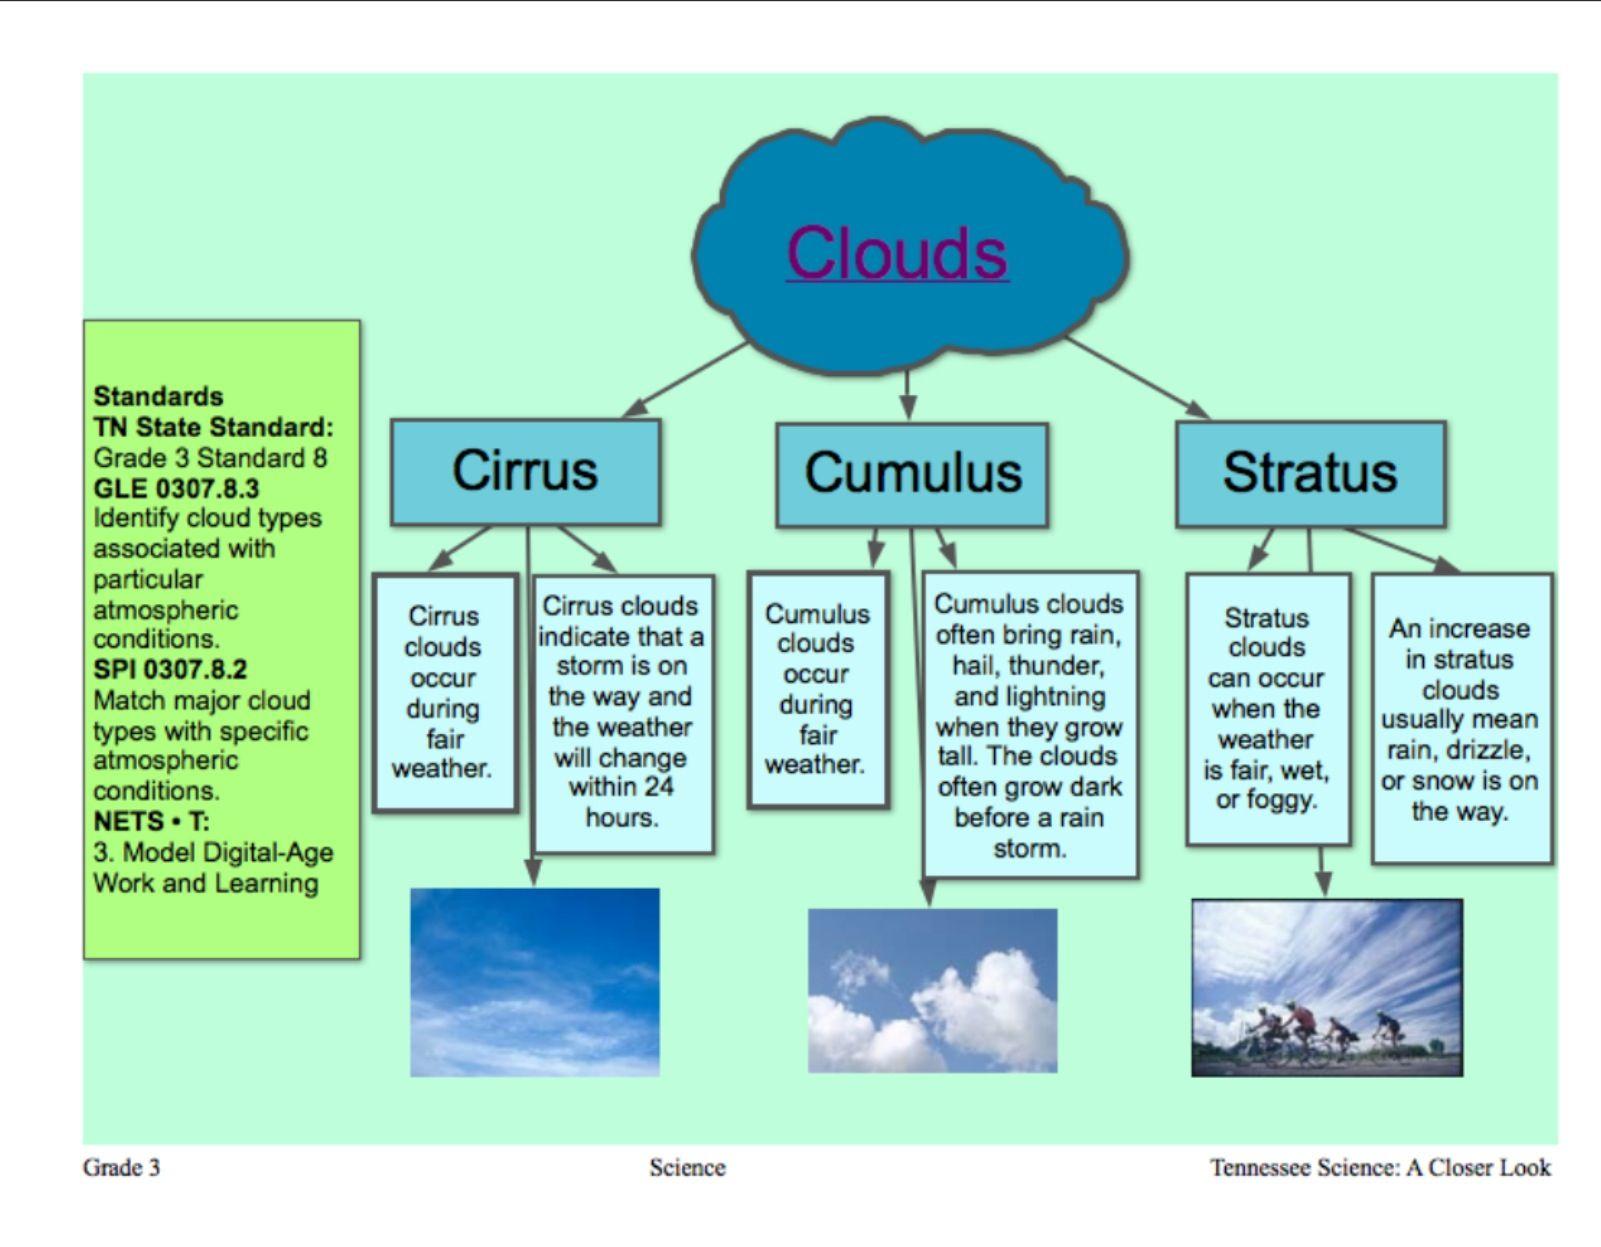 Cloud Types Tree Map